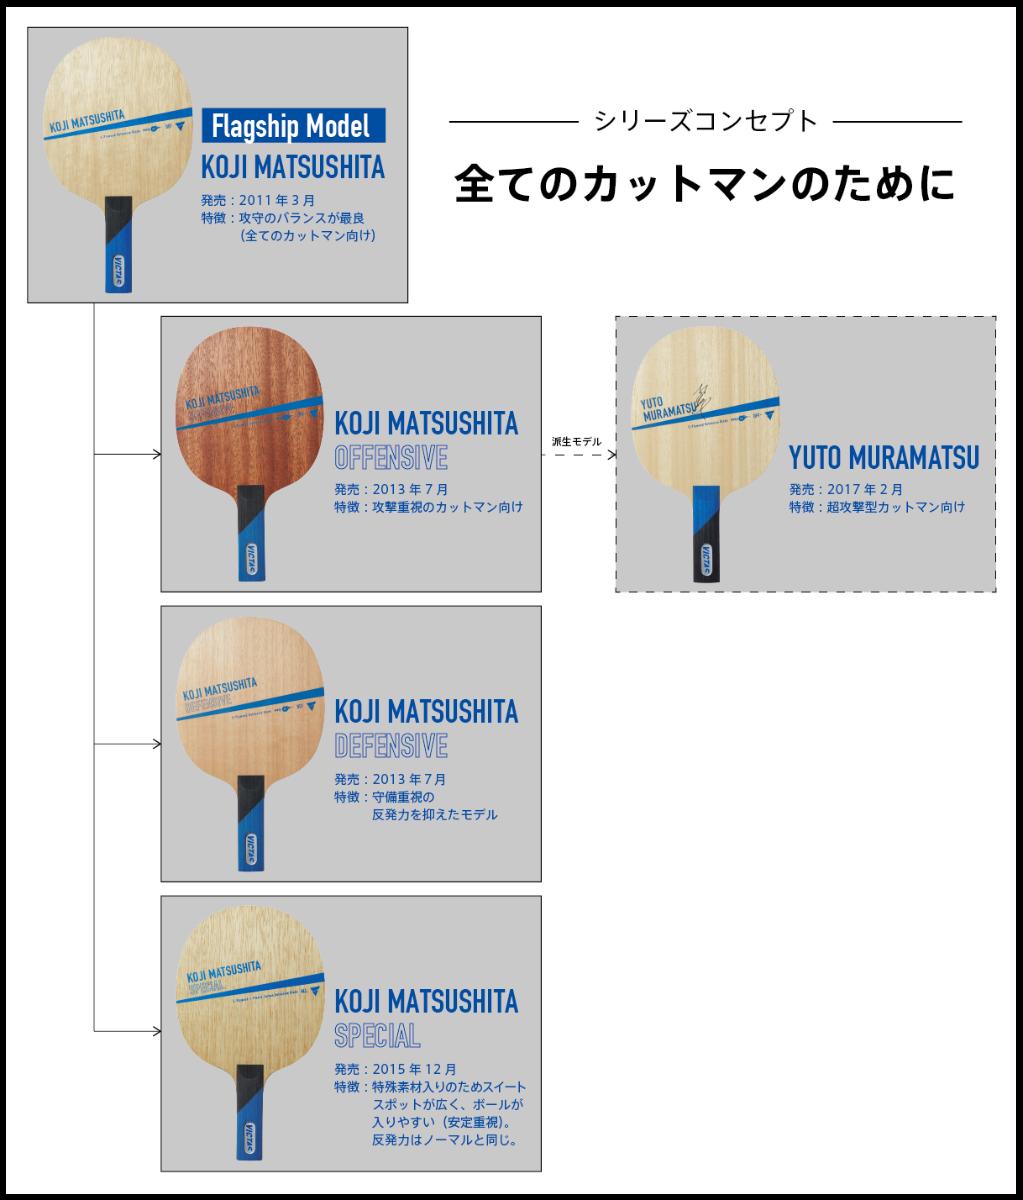 KOJI MATSUSHITA SERIES VICTAS ラケット 卓球 カットマン ディフェンシブ